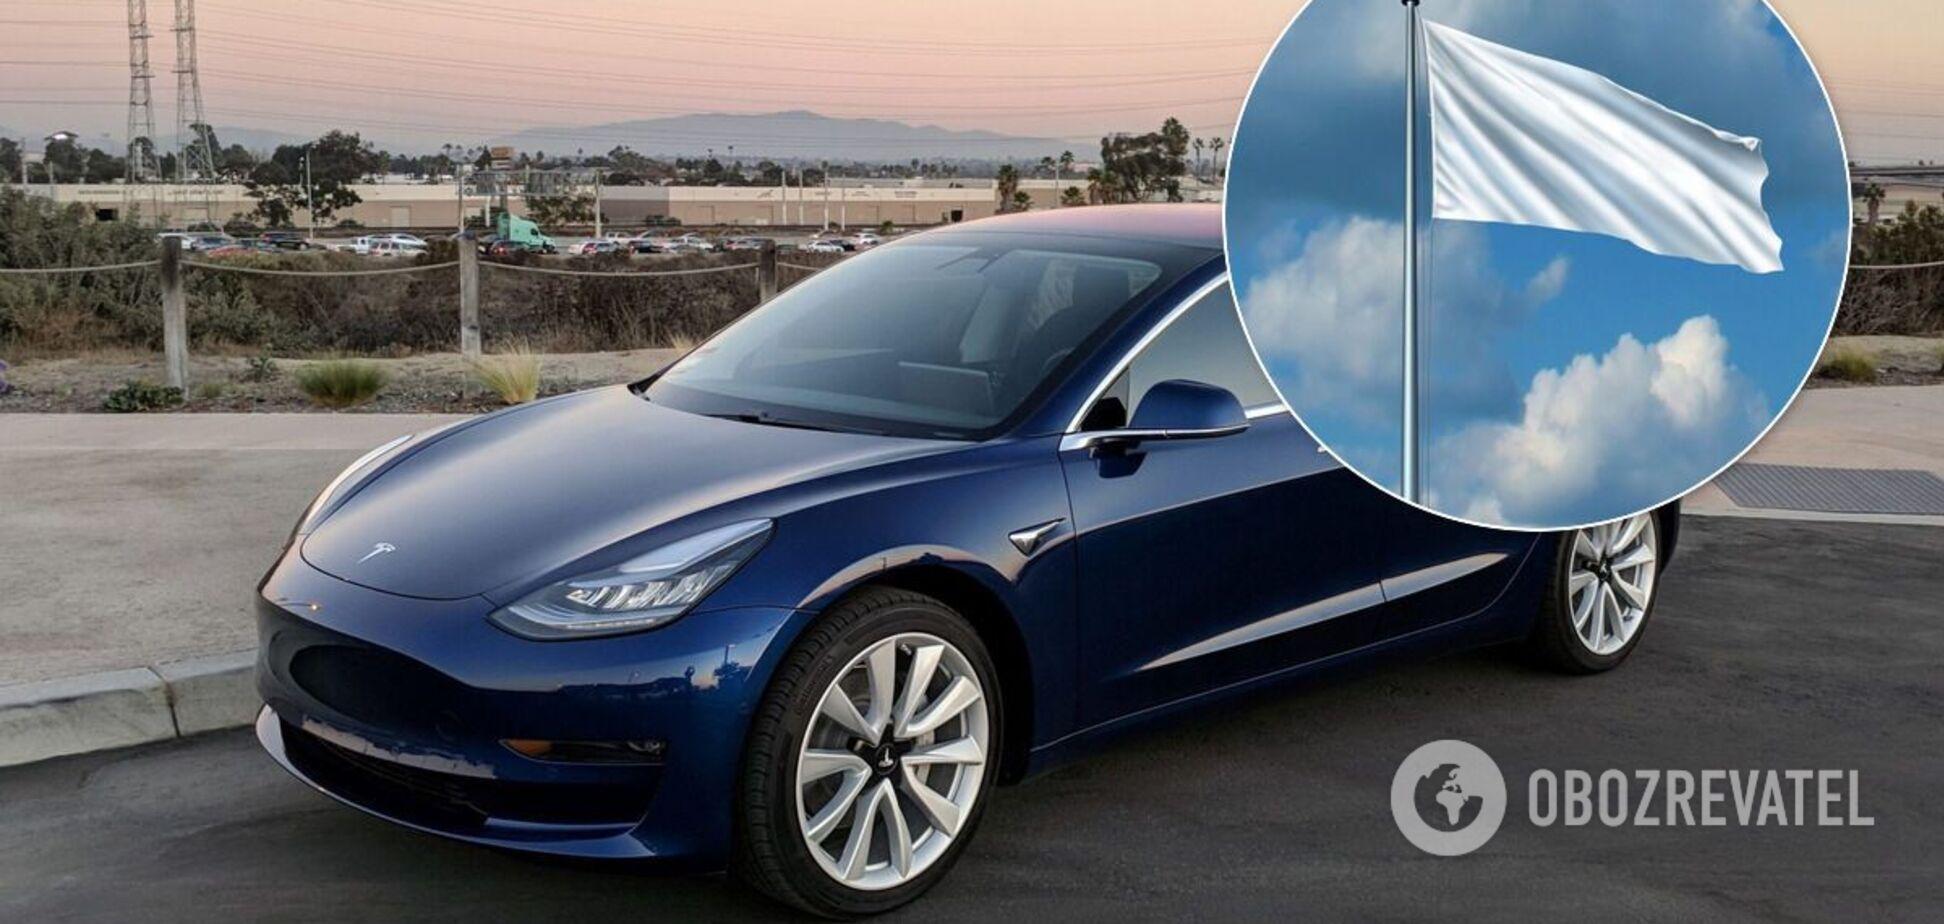 Автопилот Tesla перепутал флаг на АЗС со светофором